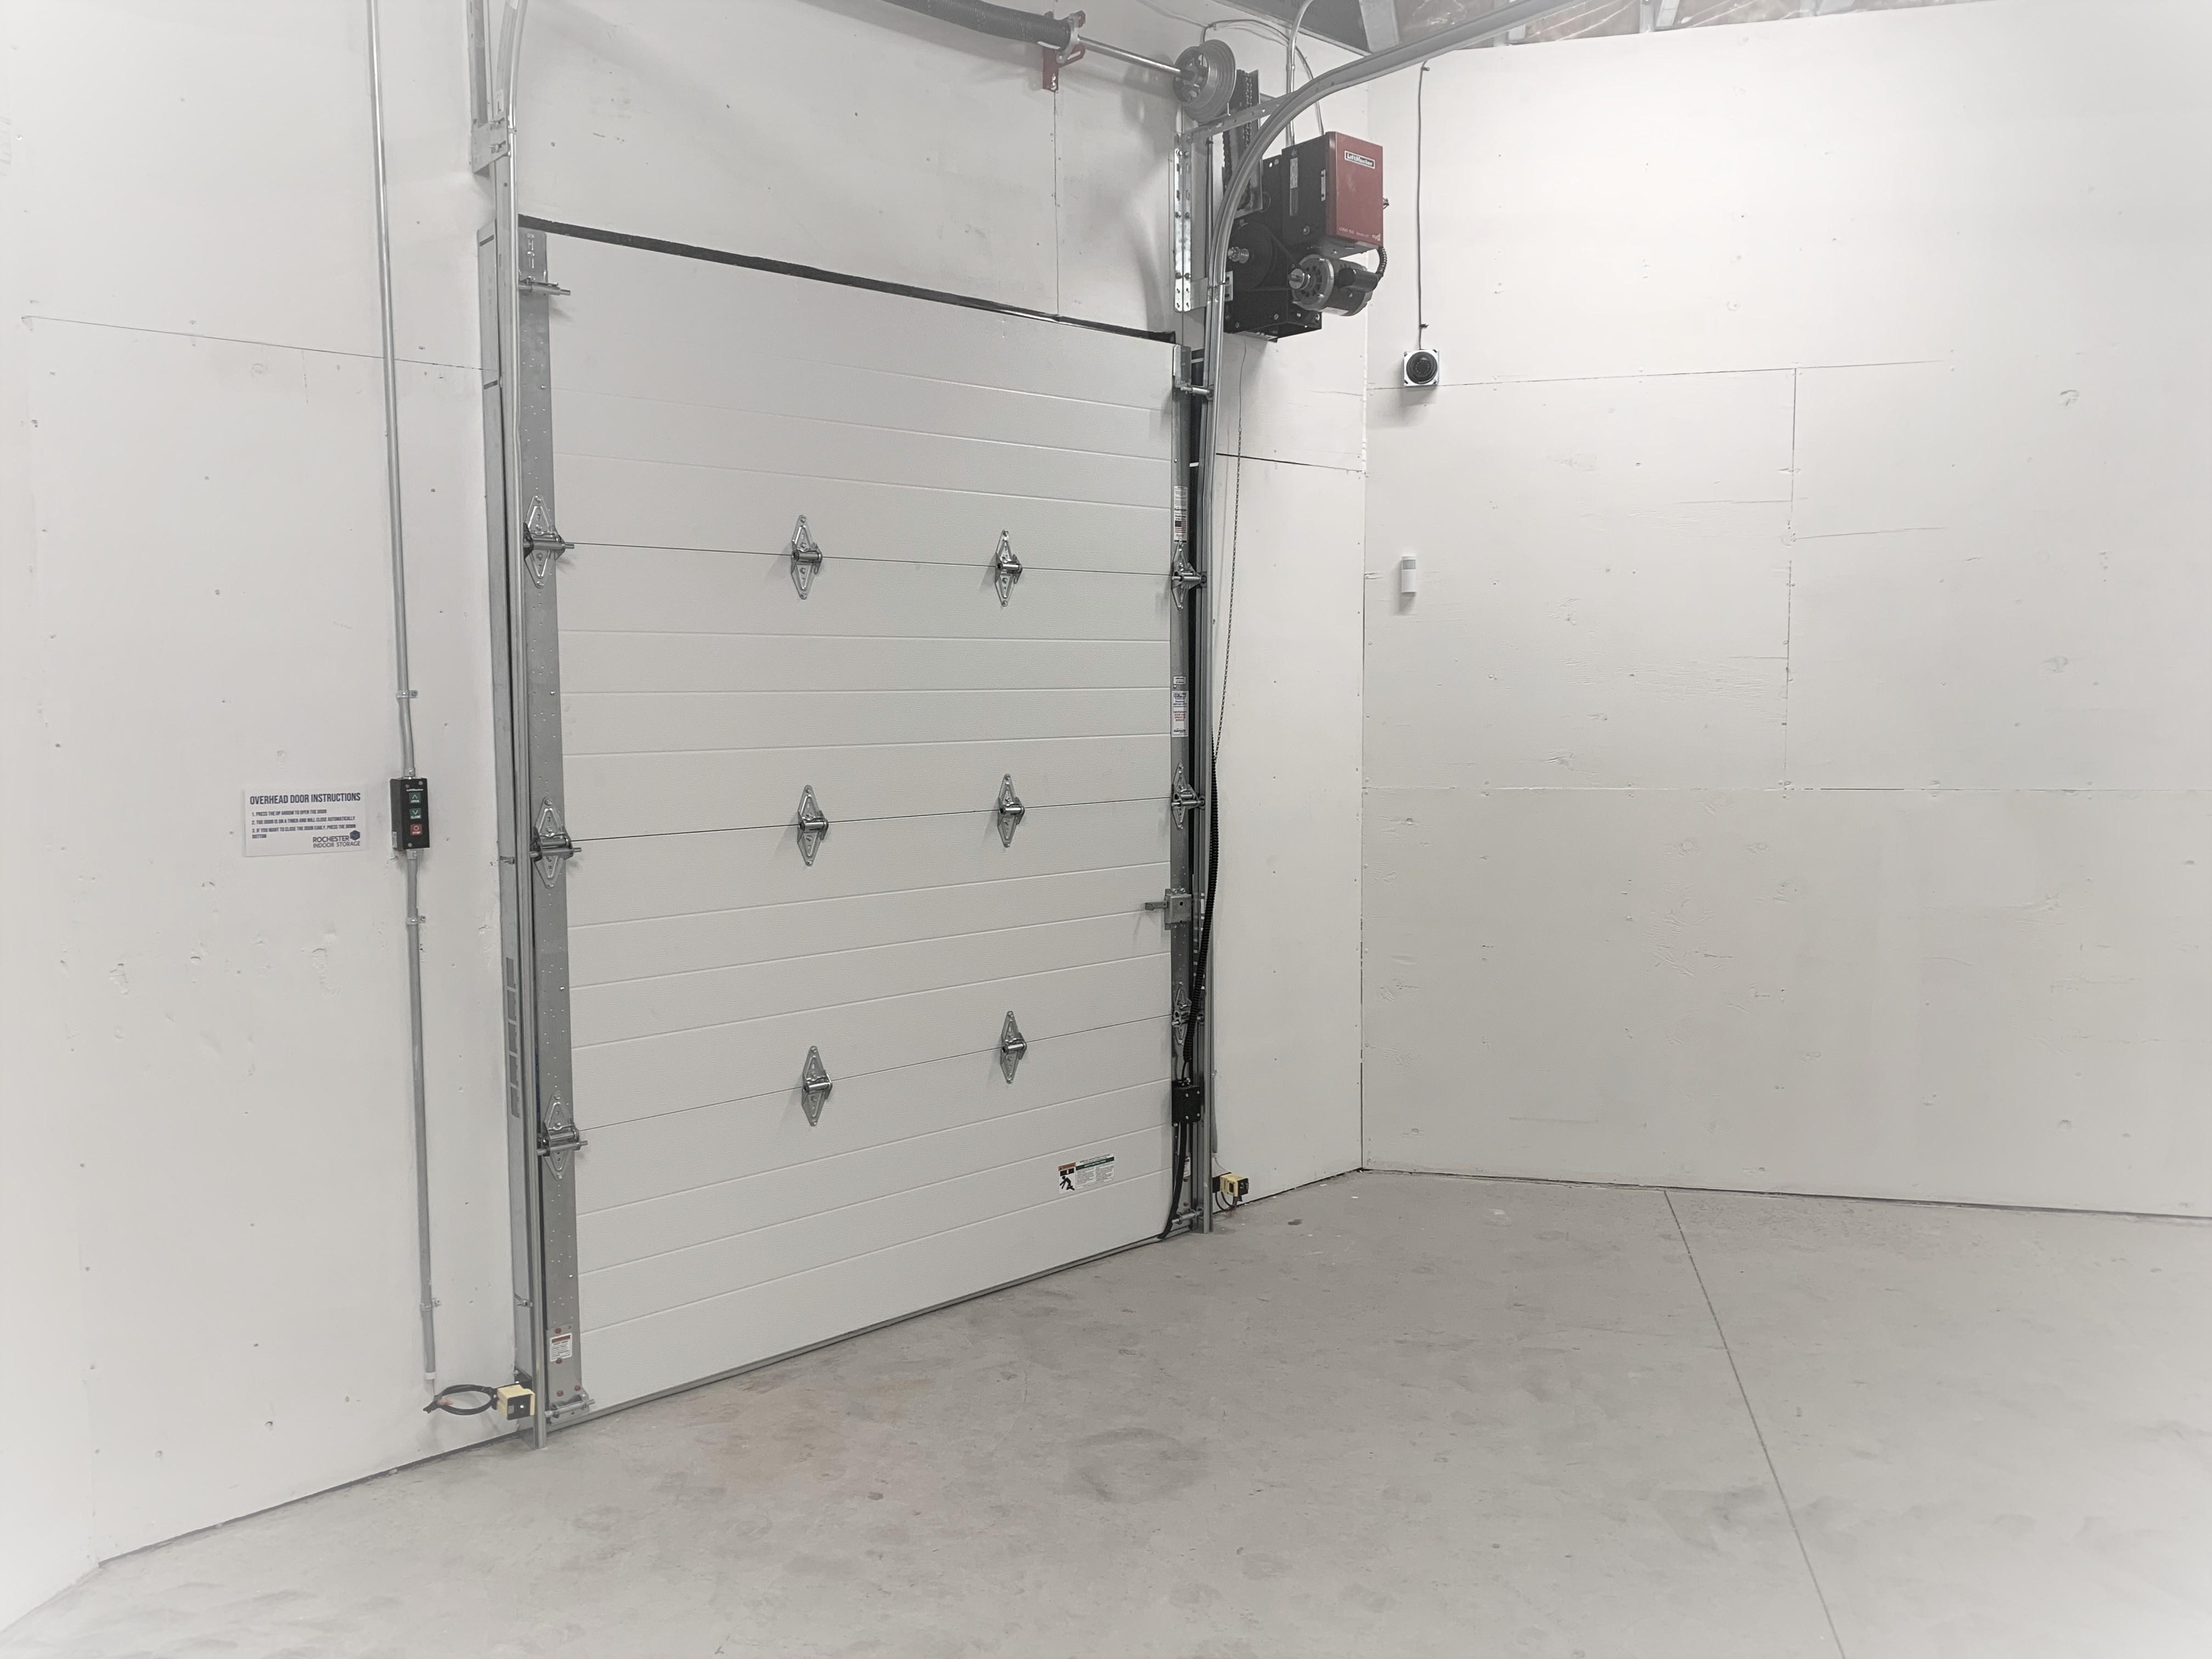 interior of storage unit with roll up door